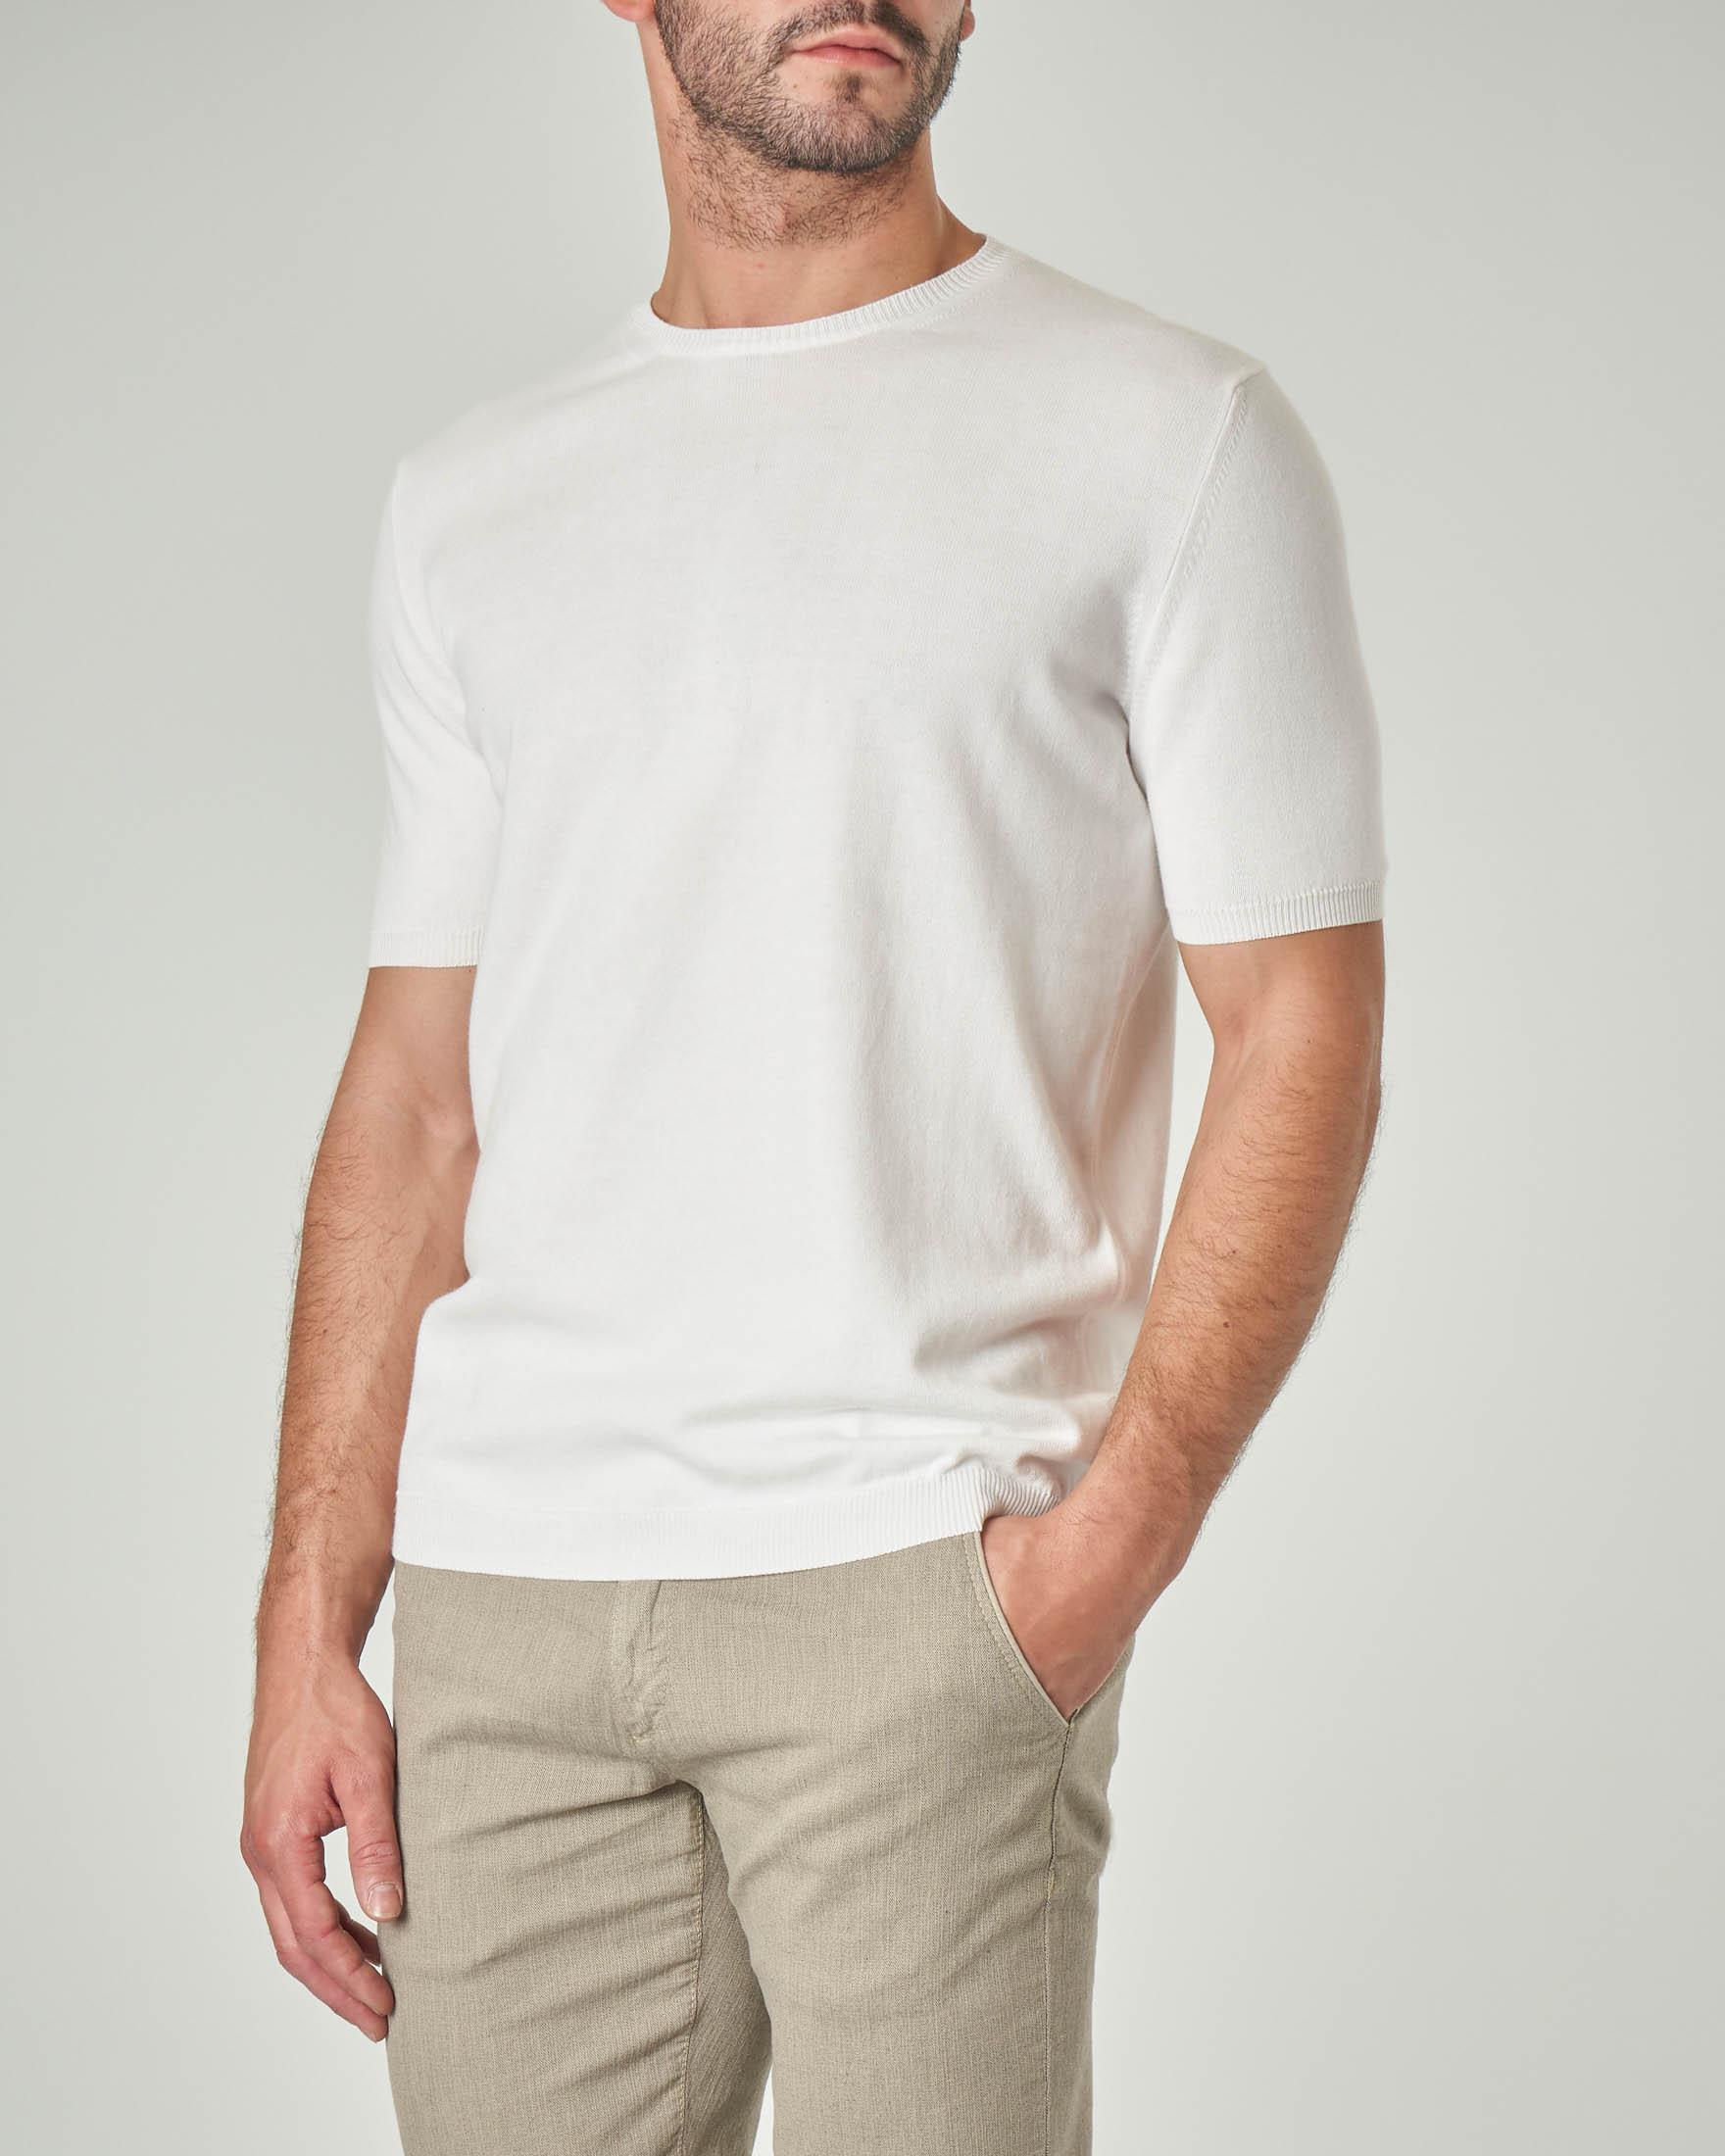 Maglia bianca a manica corta in cotone